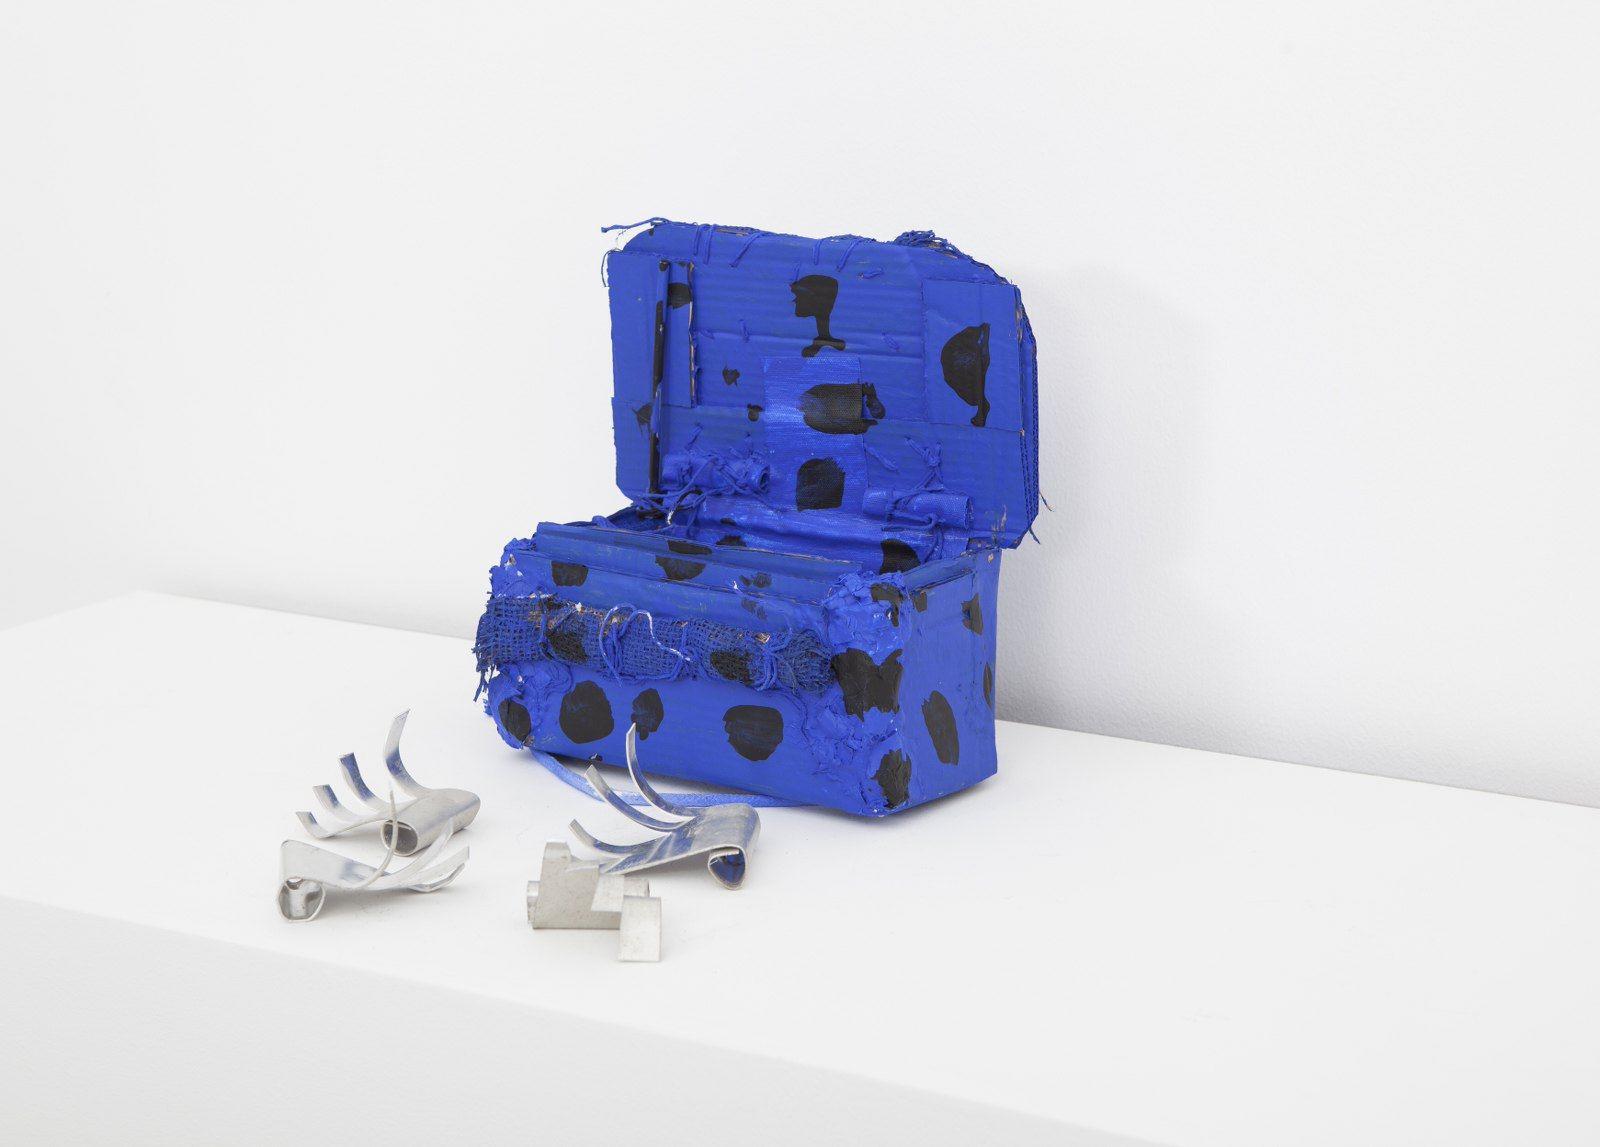 Box No 6 - Blue with Black Spots, 2014, Mixed Media